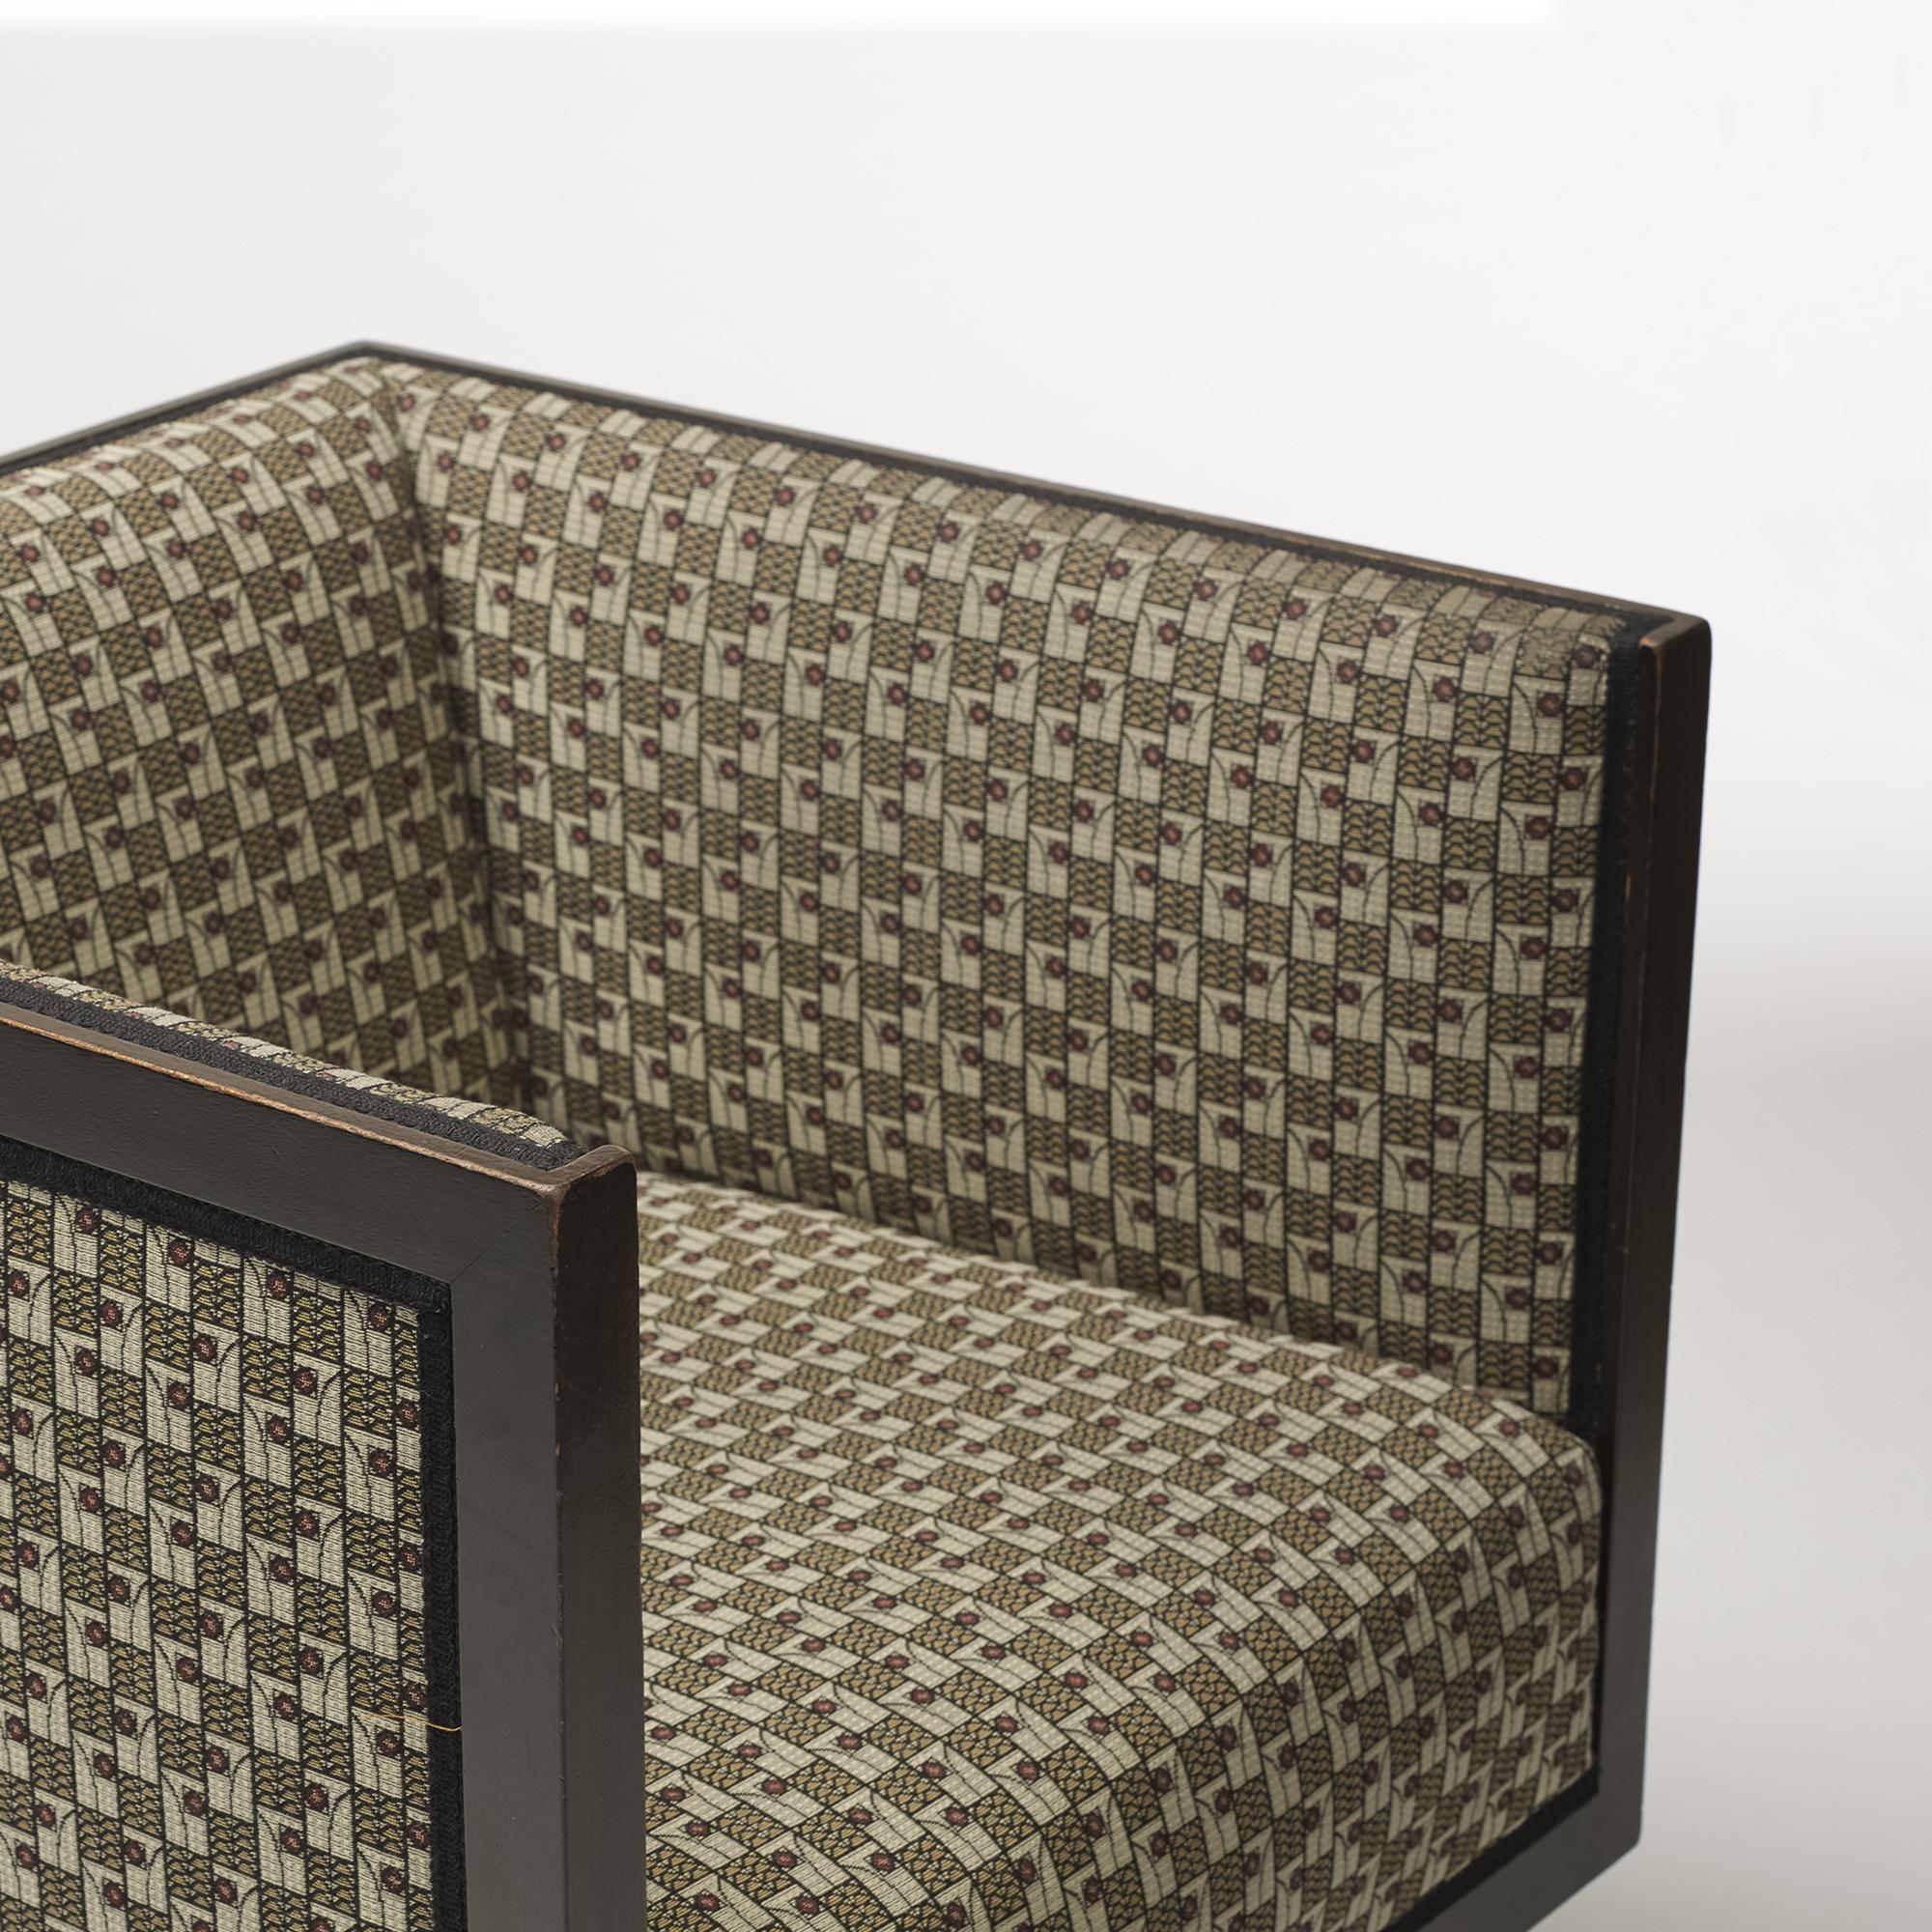 355: Josef Hoffmann / Cabinett lounge chairs, pair (4 of 5)